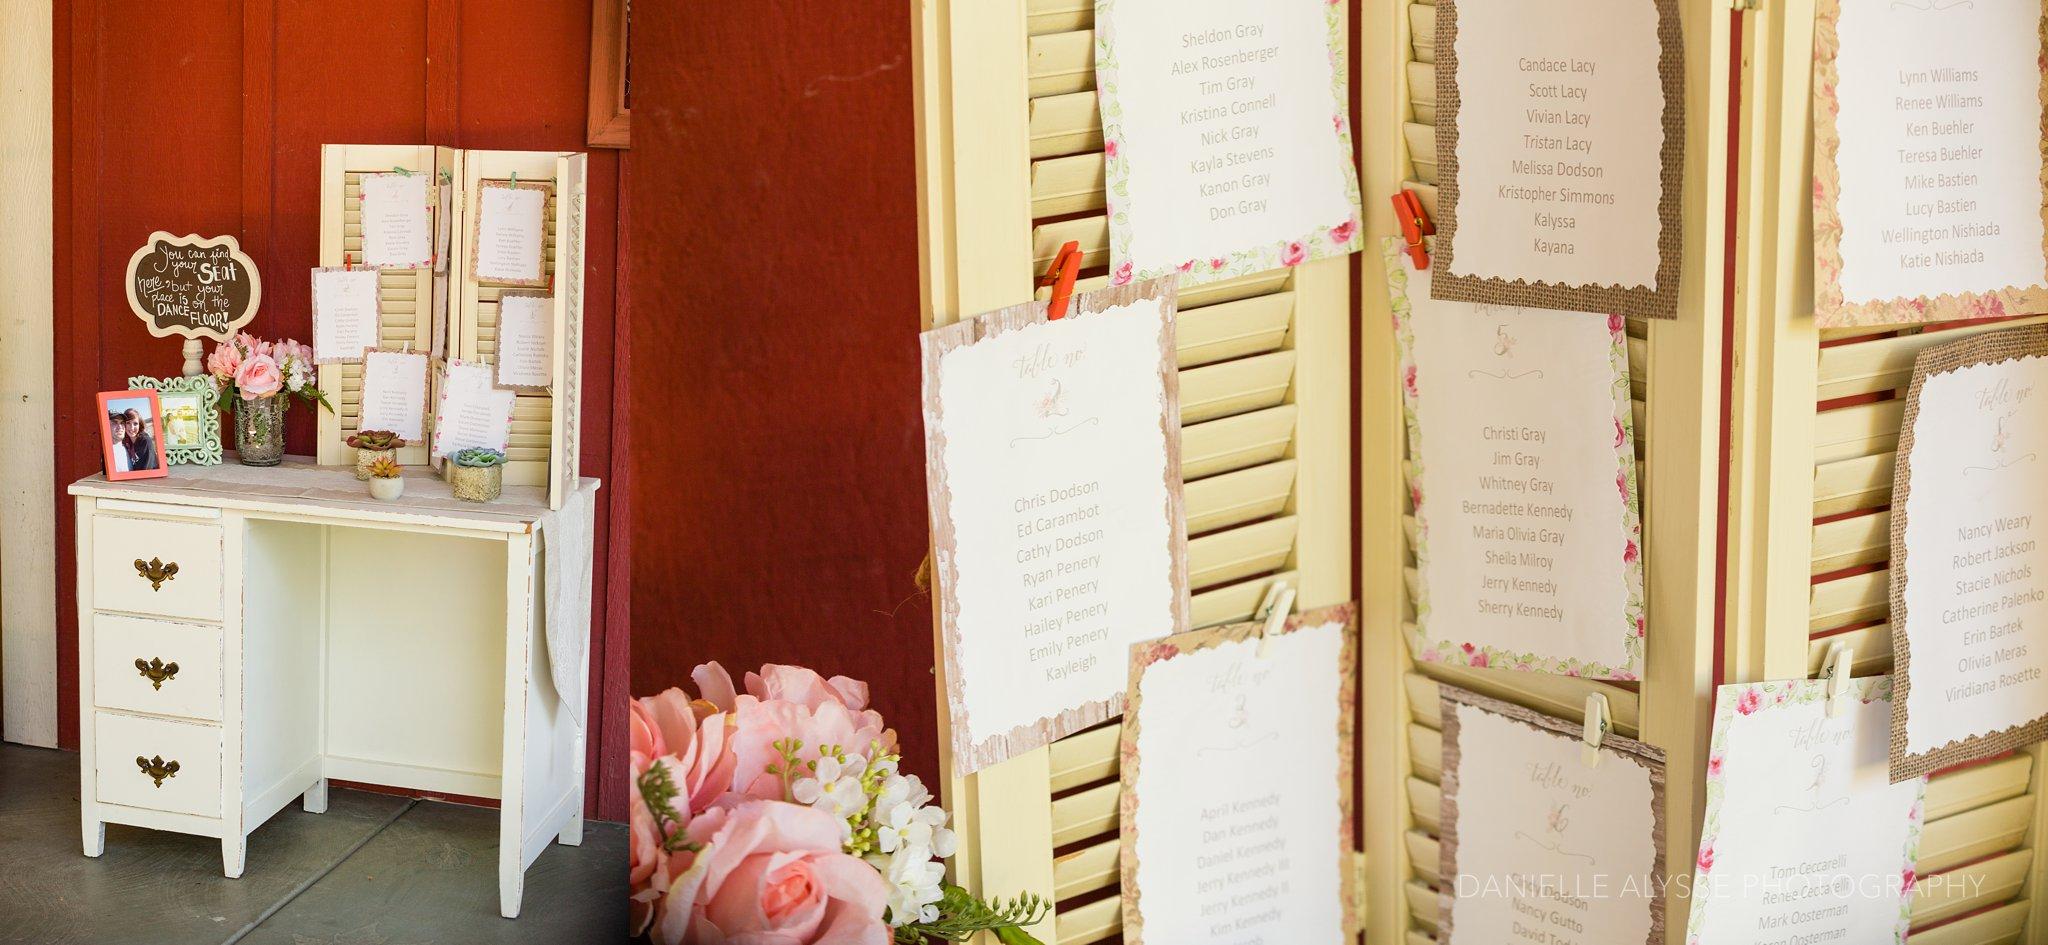 170507_blog_megan_david_wedding_loomis_flower_farm_inn_danielle_alysse_photography_sacramento_photographer0420_WEB.jpg